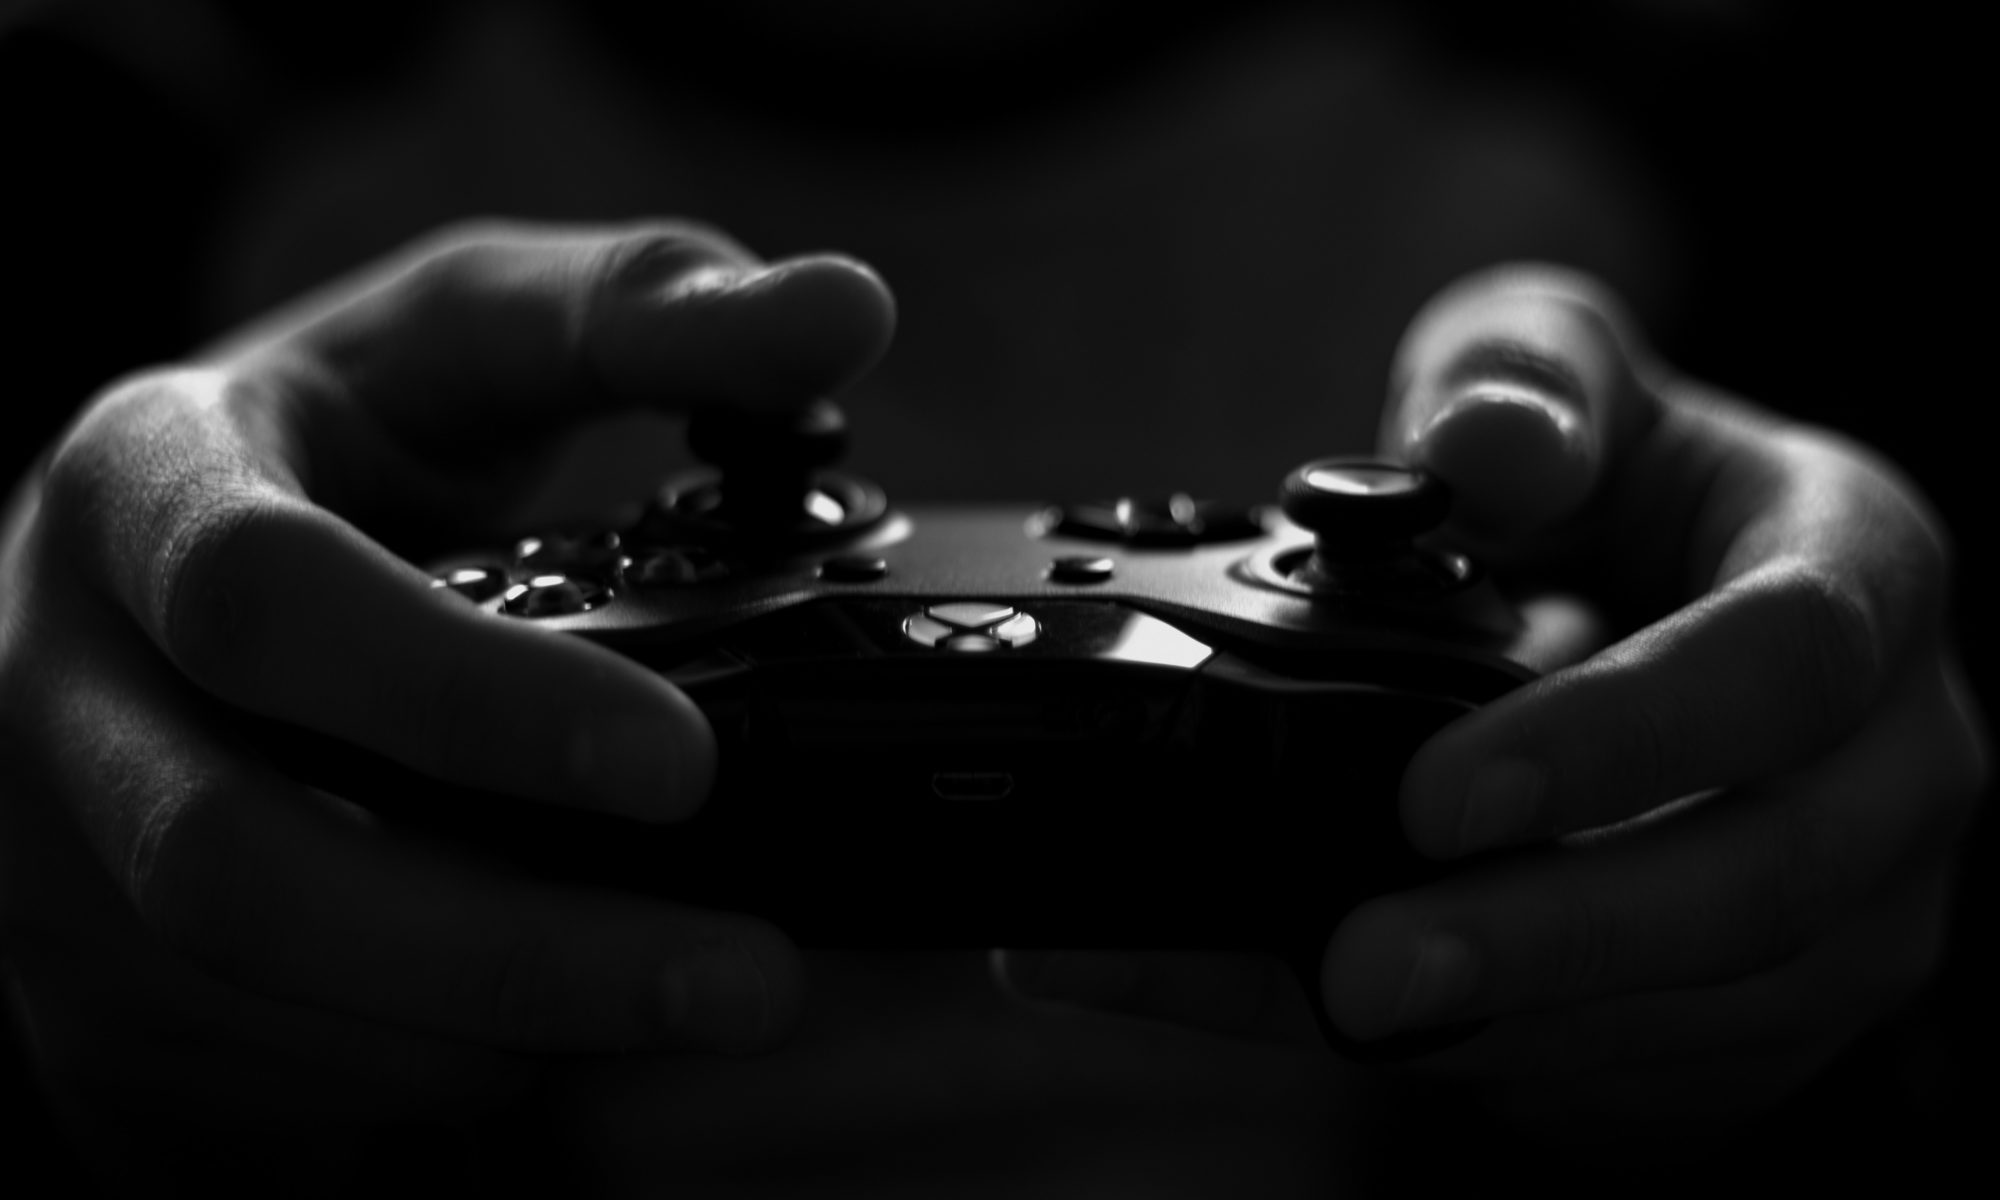 #videogamesarenottoblame